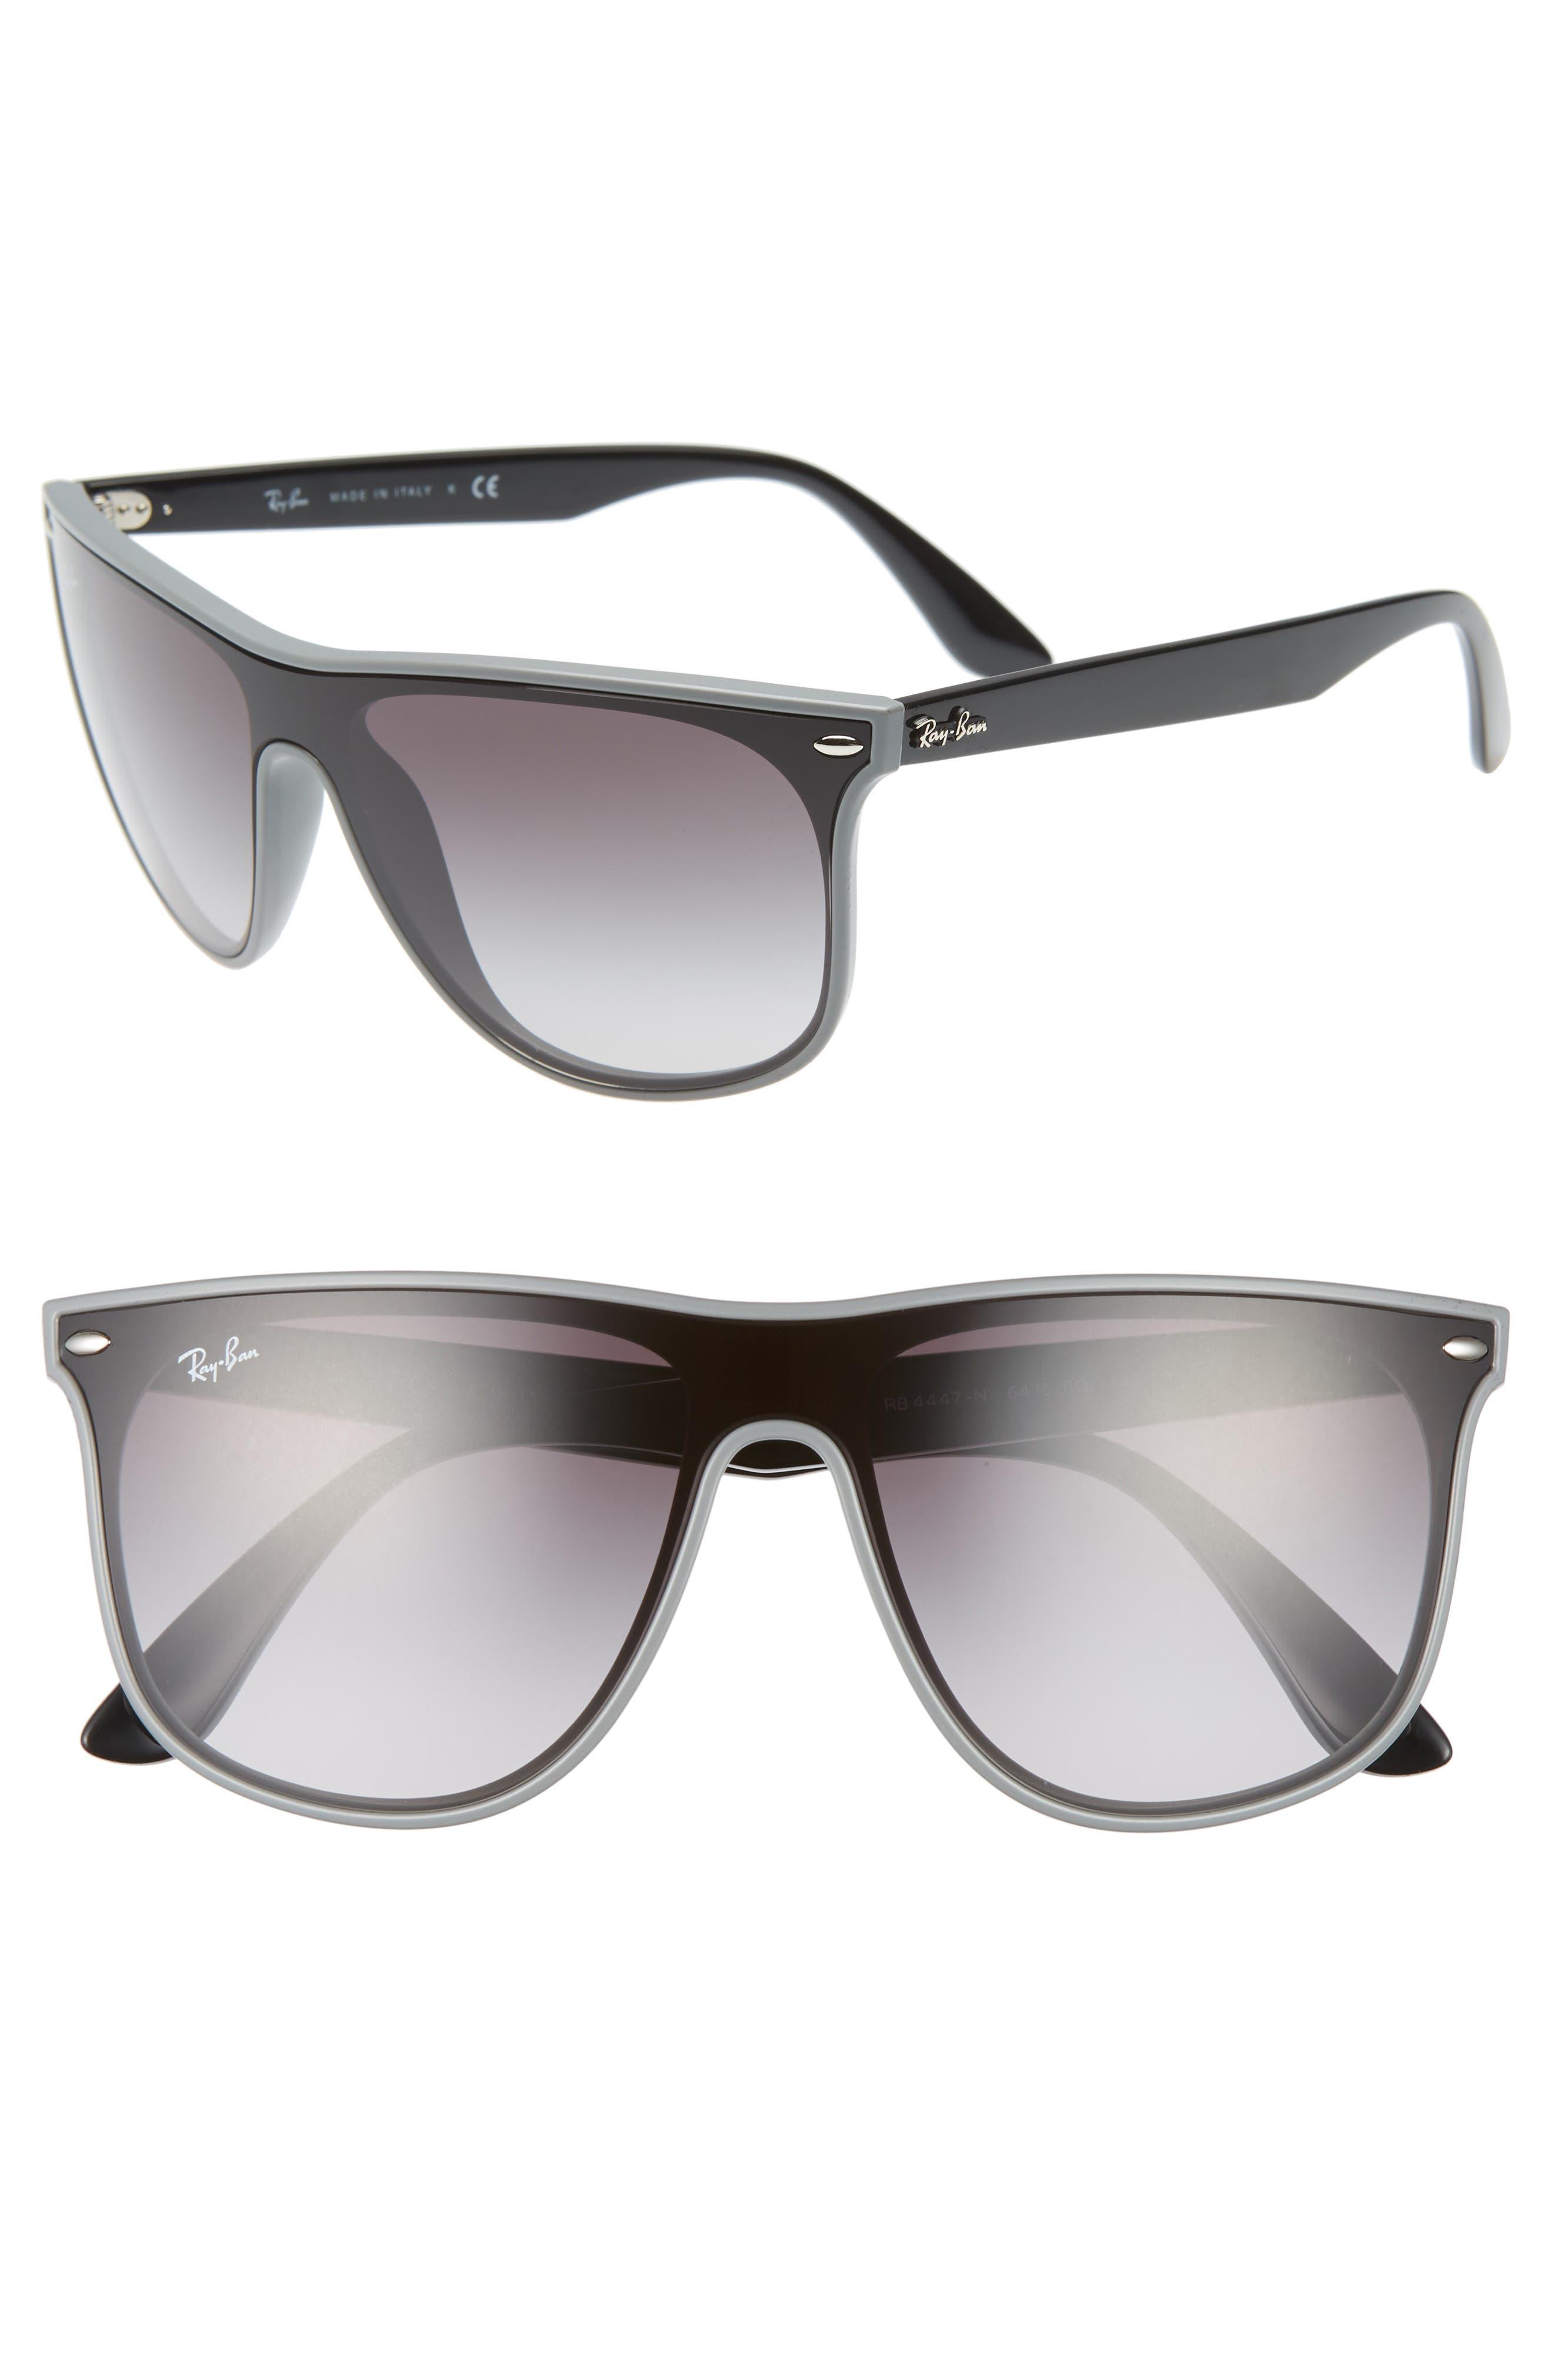 0914ba01b615d Ray-Ban Blaze 55Mm Sunglasses - Grey